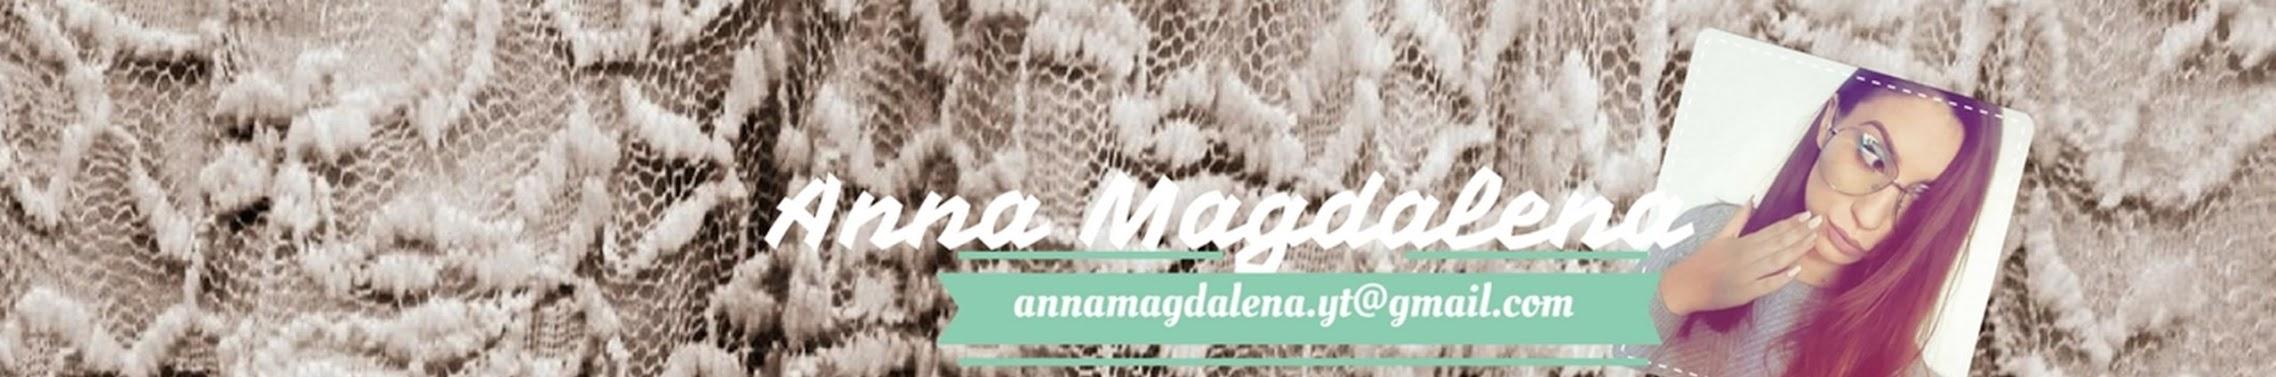 AnnaMagdalena